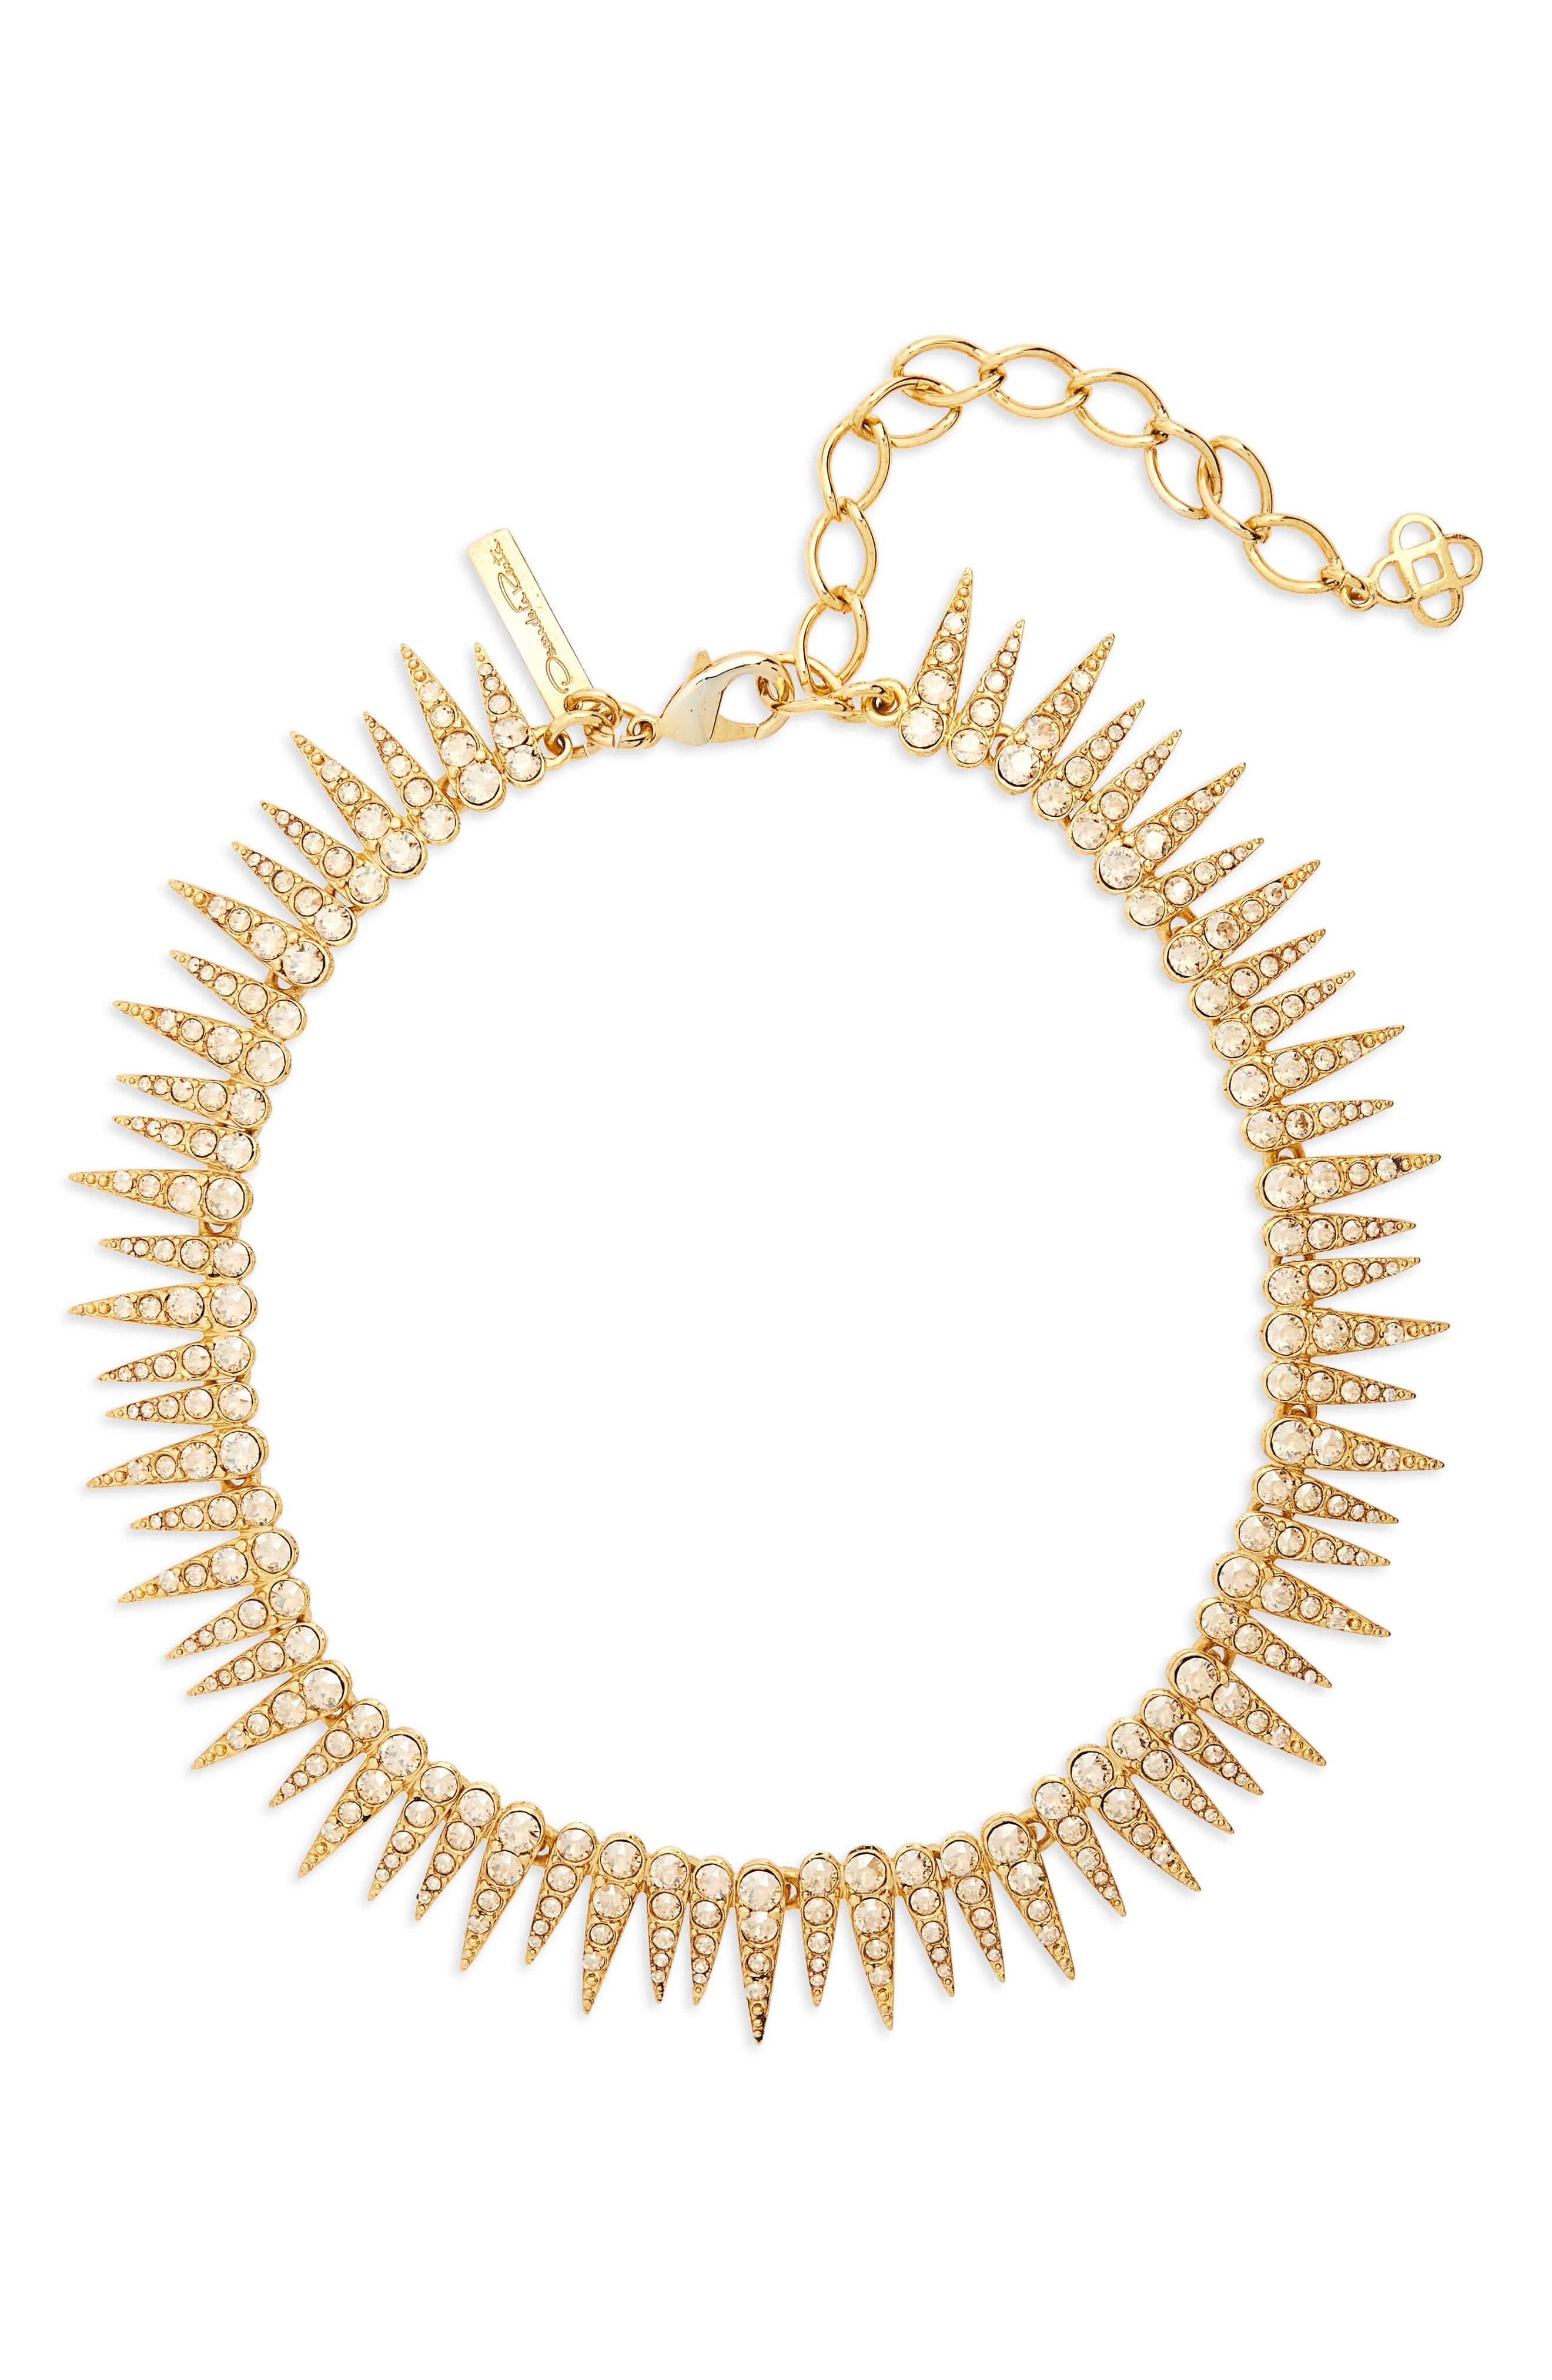 Crystal Sea Urchin Necklace,                         Main,                         color, CRYSTAL GOLD SHADOW